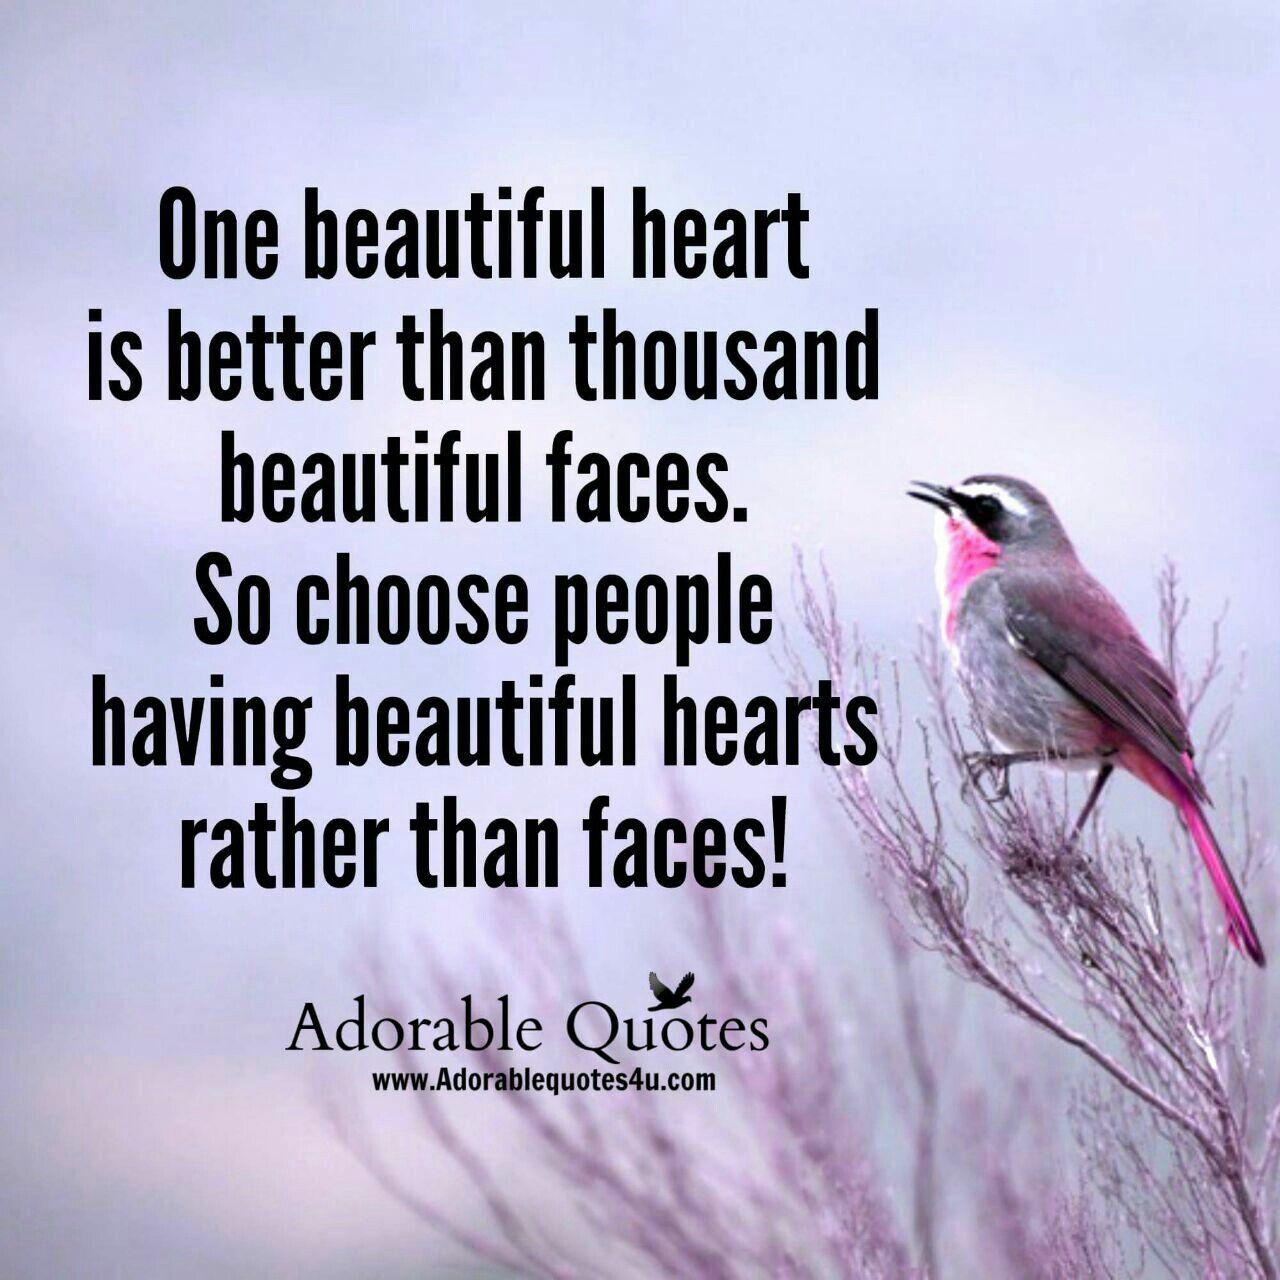 Pin by Amutharani Rengasamy on General quote Beautiful